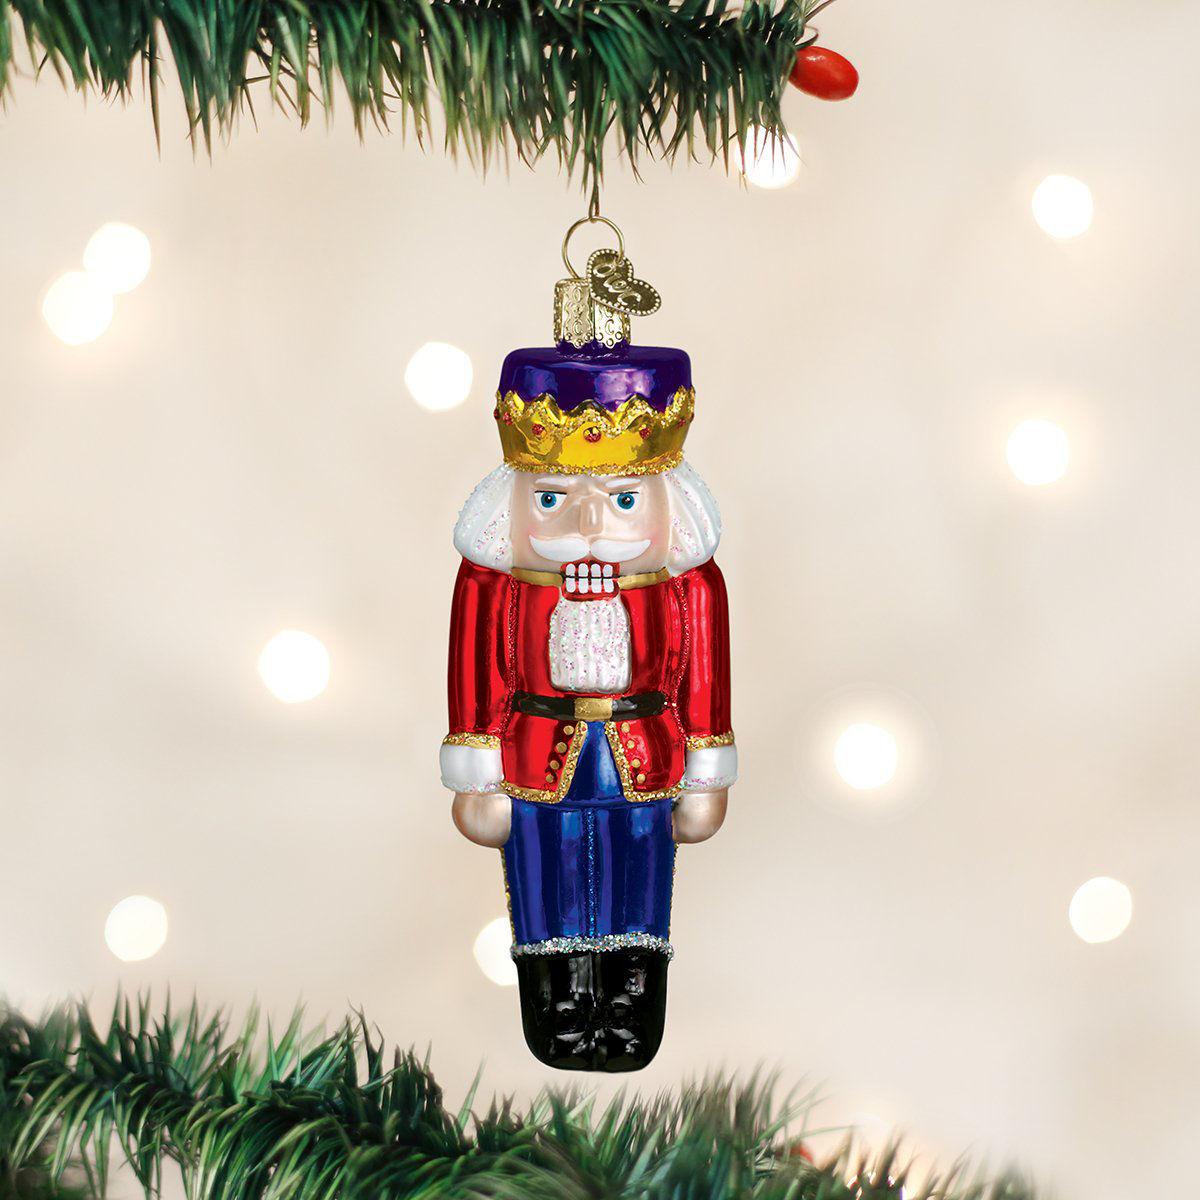 Nutcracker Prince Ornament by Old World Christmas